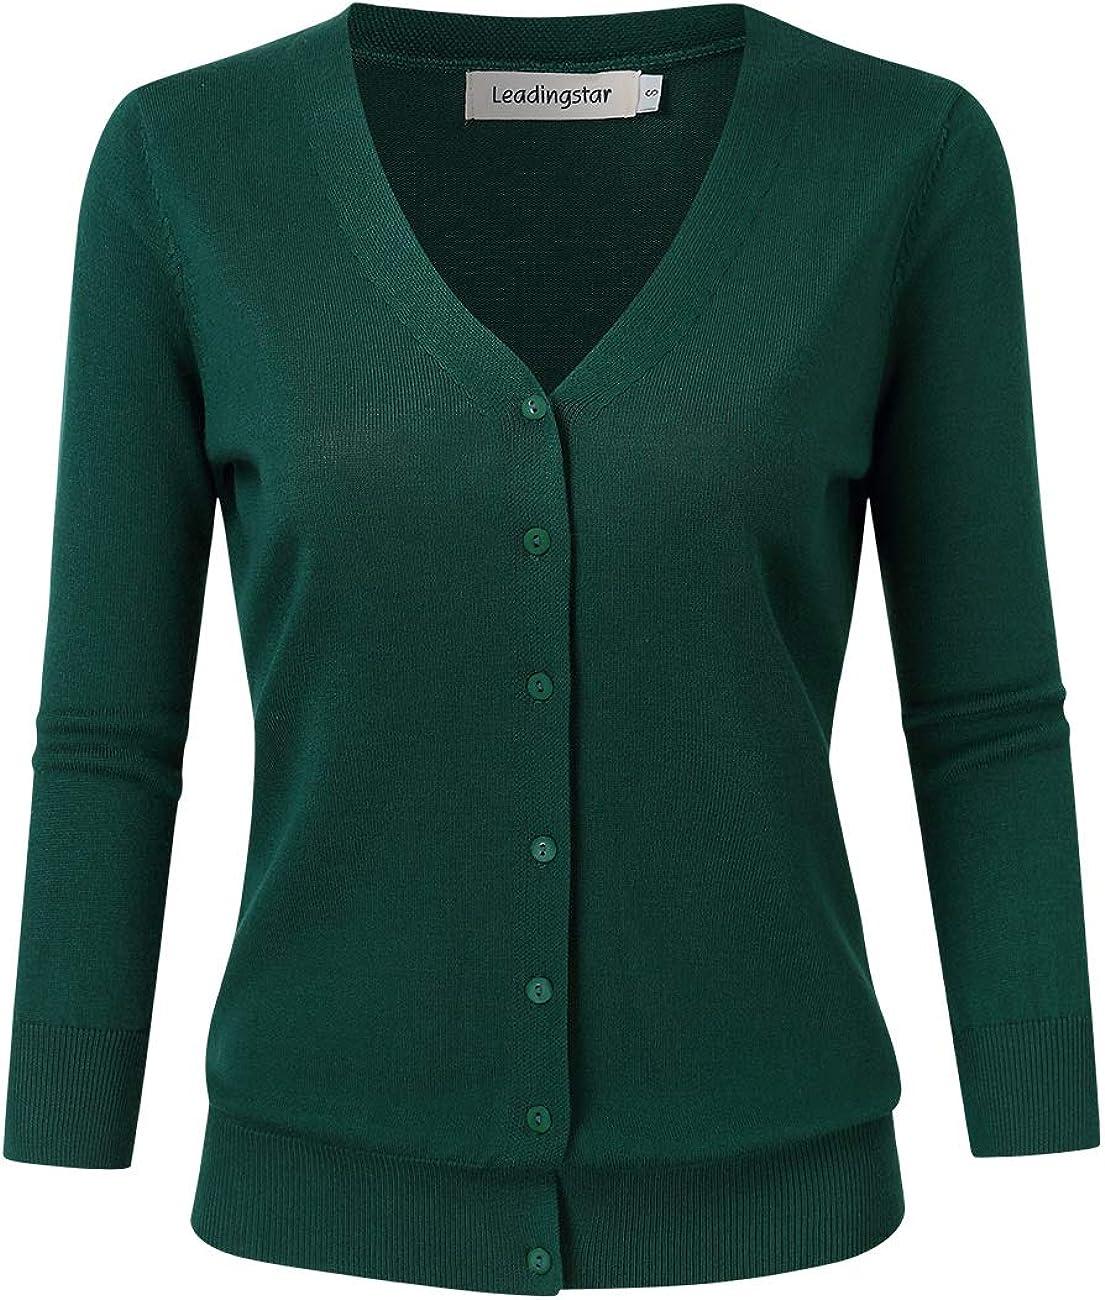 Portland Mall Popular brand Leadingstar Women's 3 4 Sleeve Button Sweater Cardigan Down